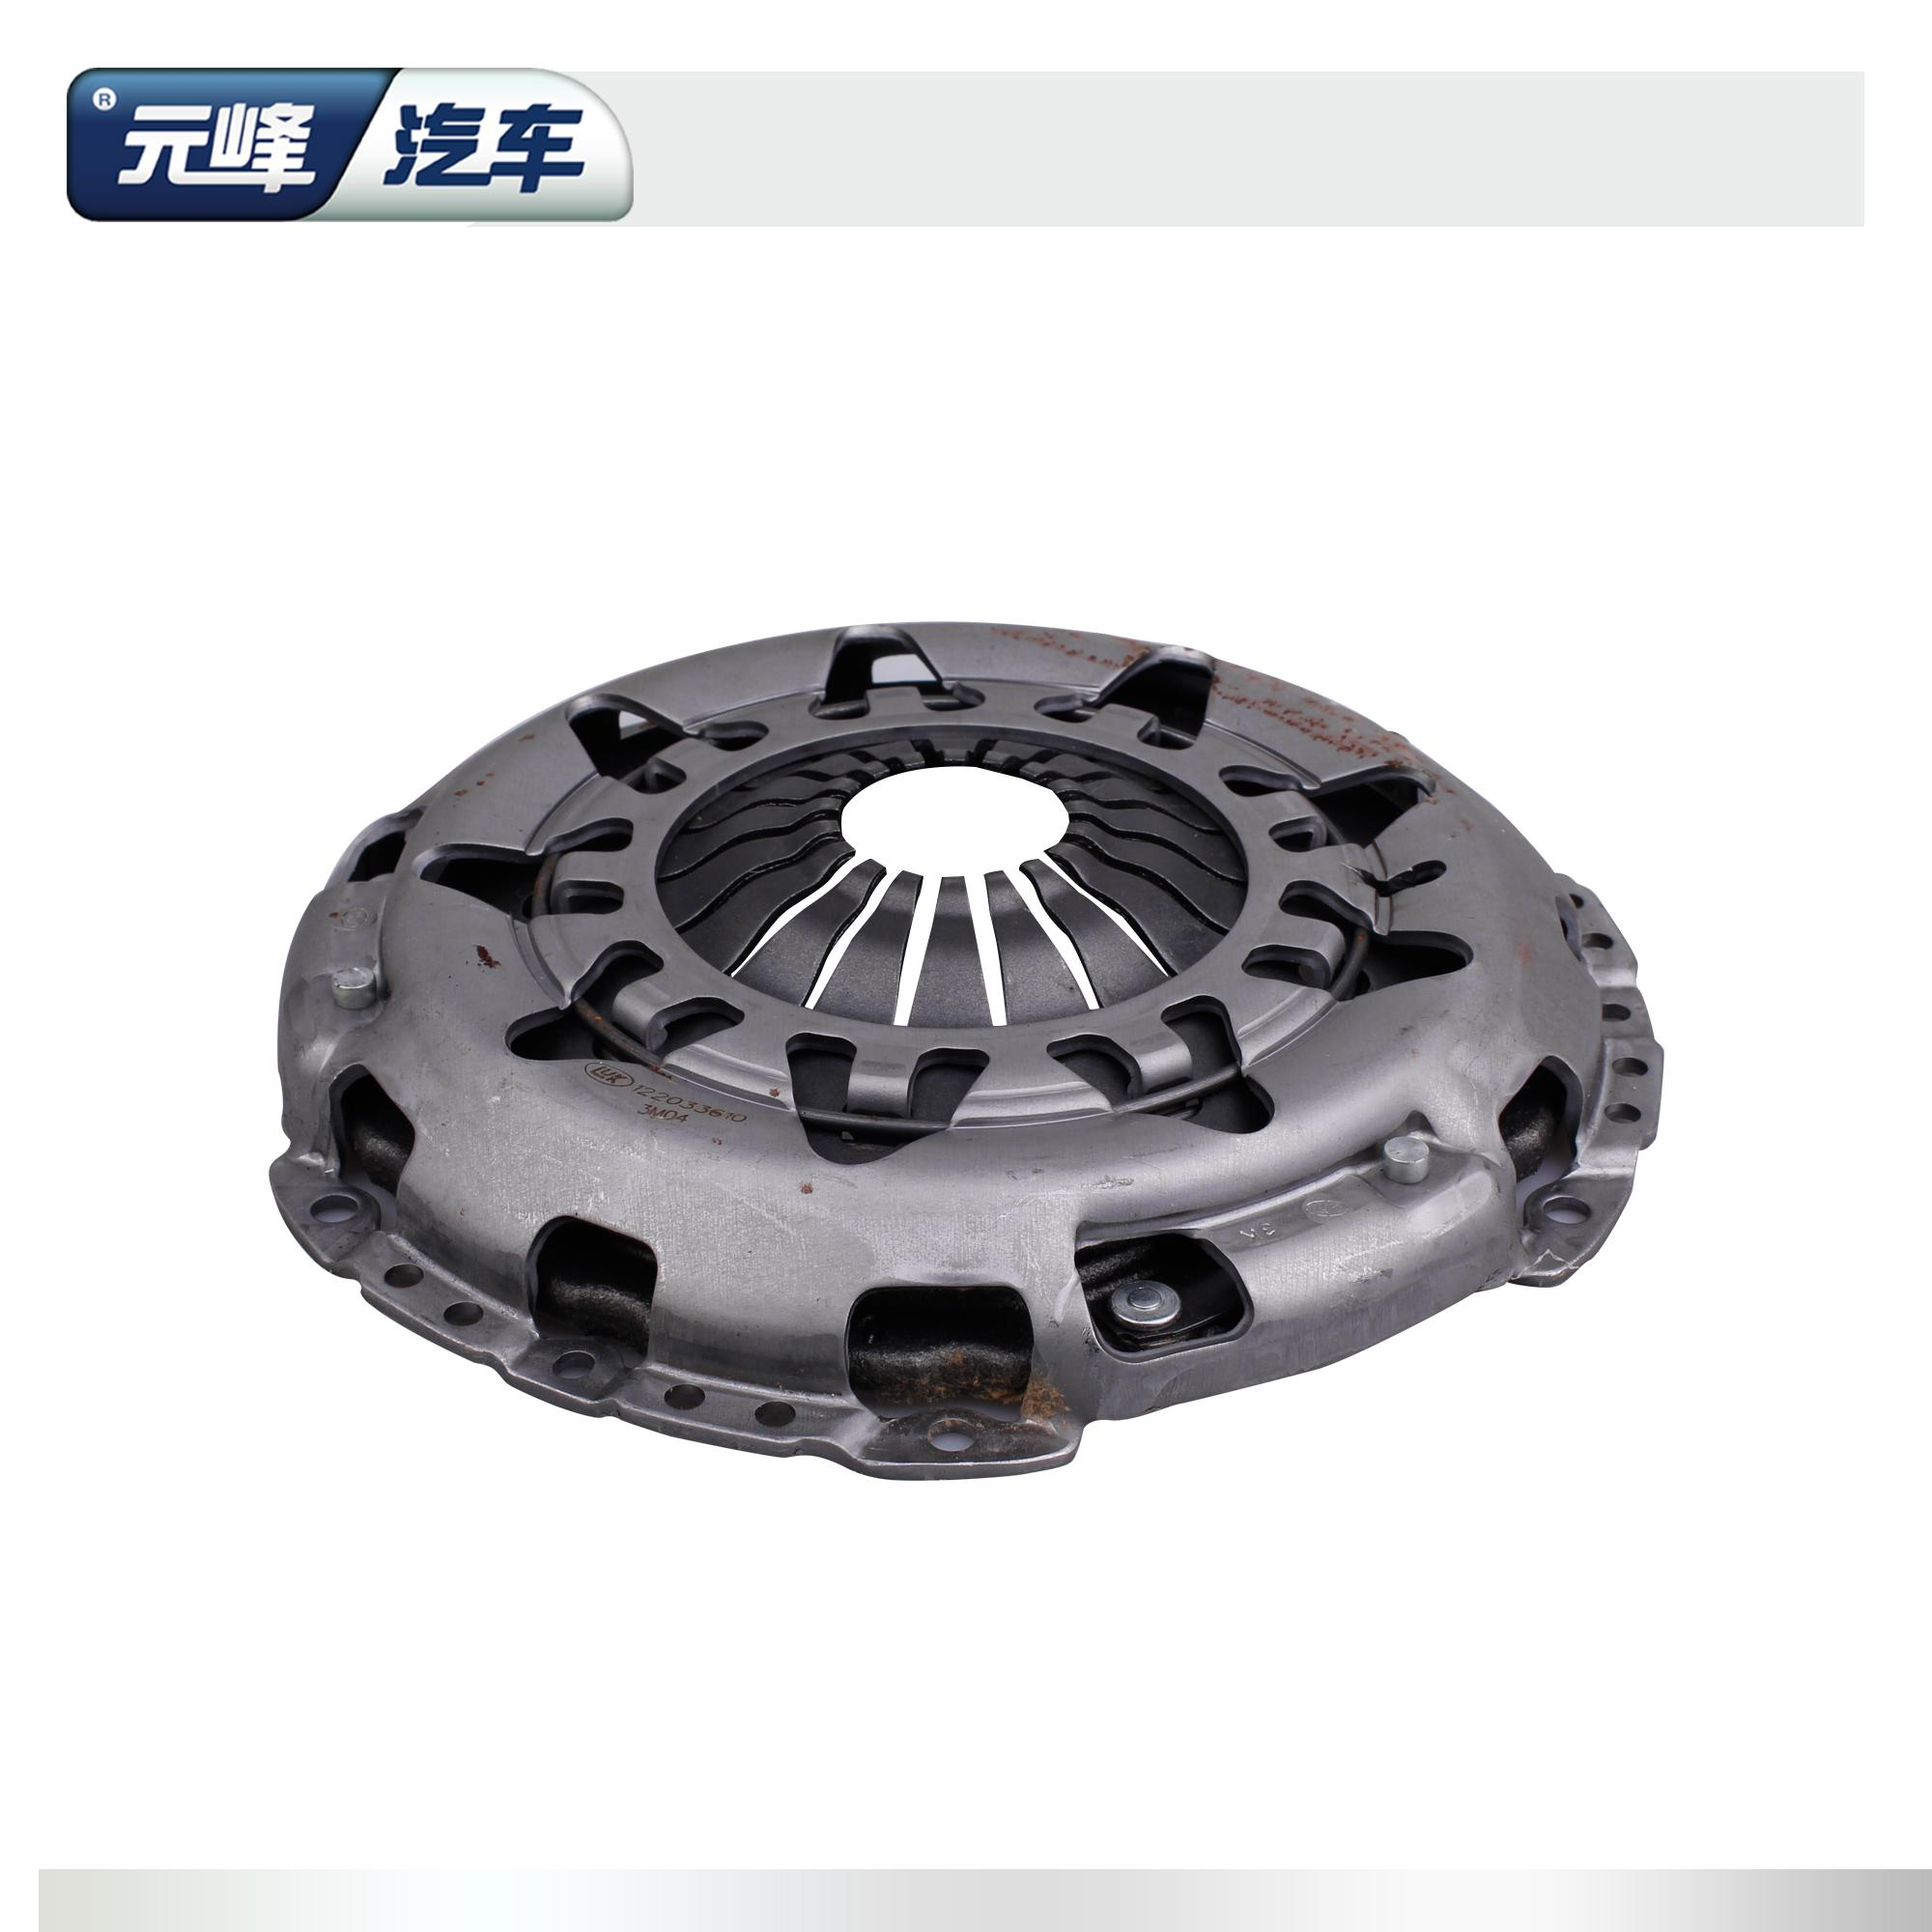 LUK原装正品离合器三件套分离轴承离合器压盘大众斯柯达1.6L/2.0